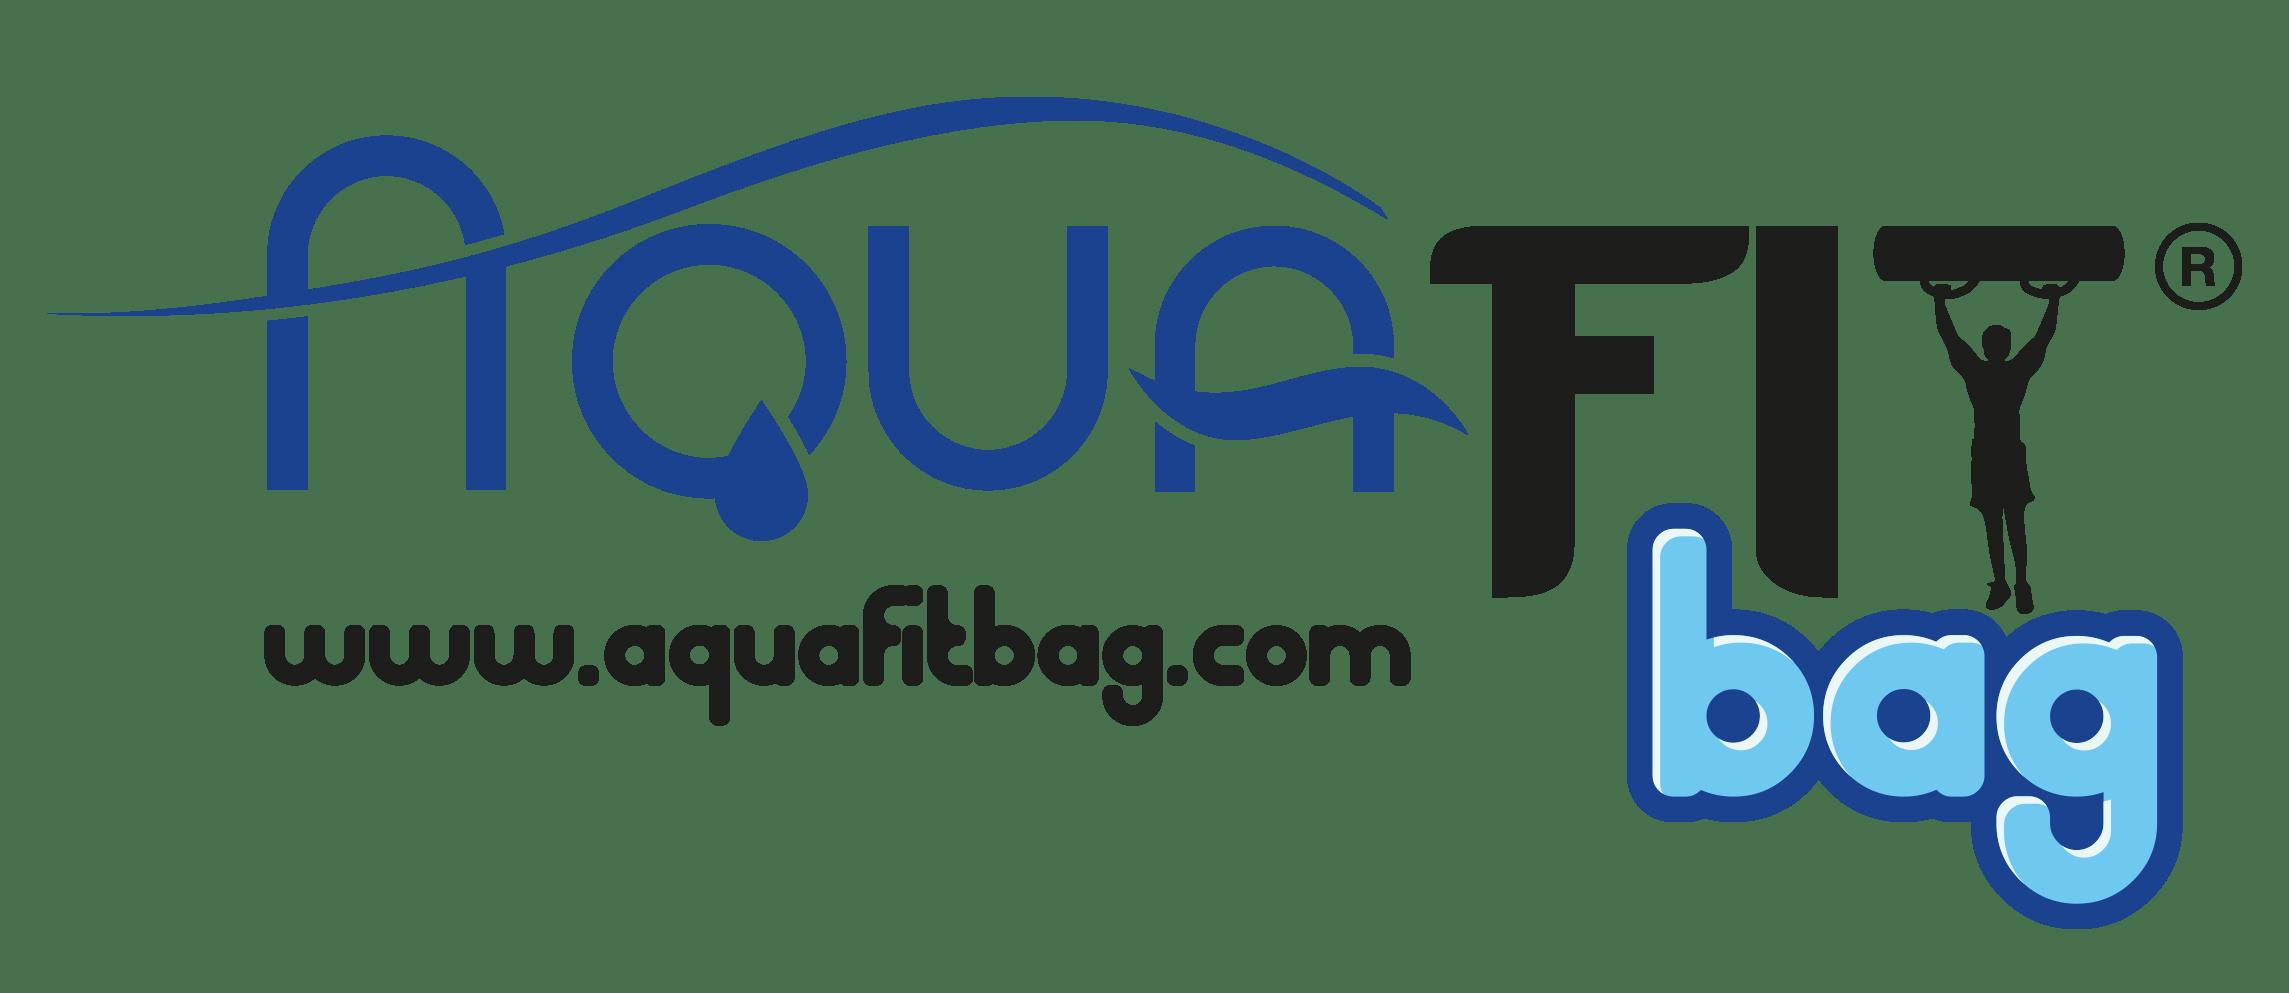 Aquafitbag